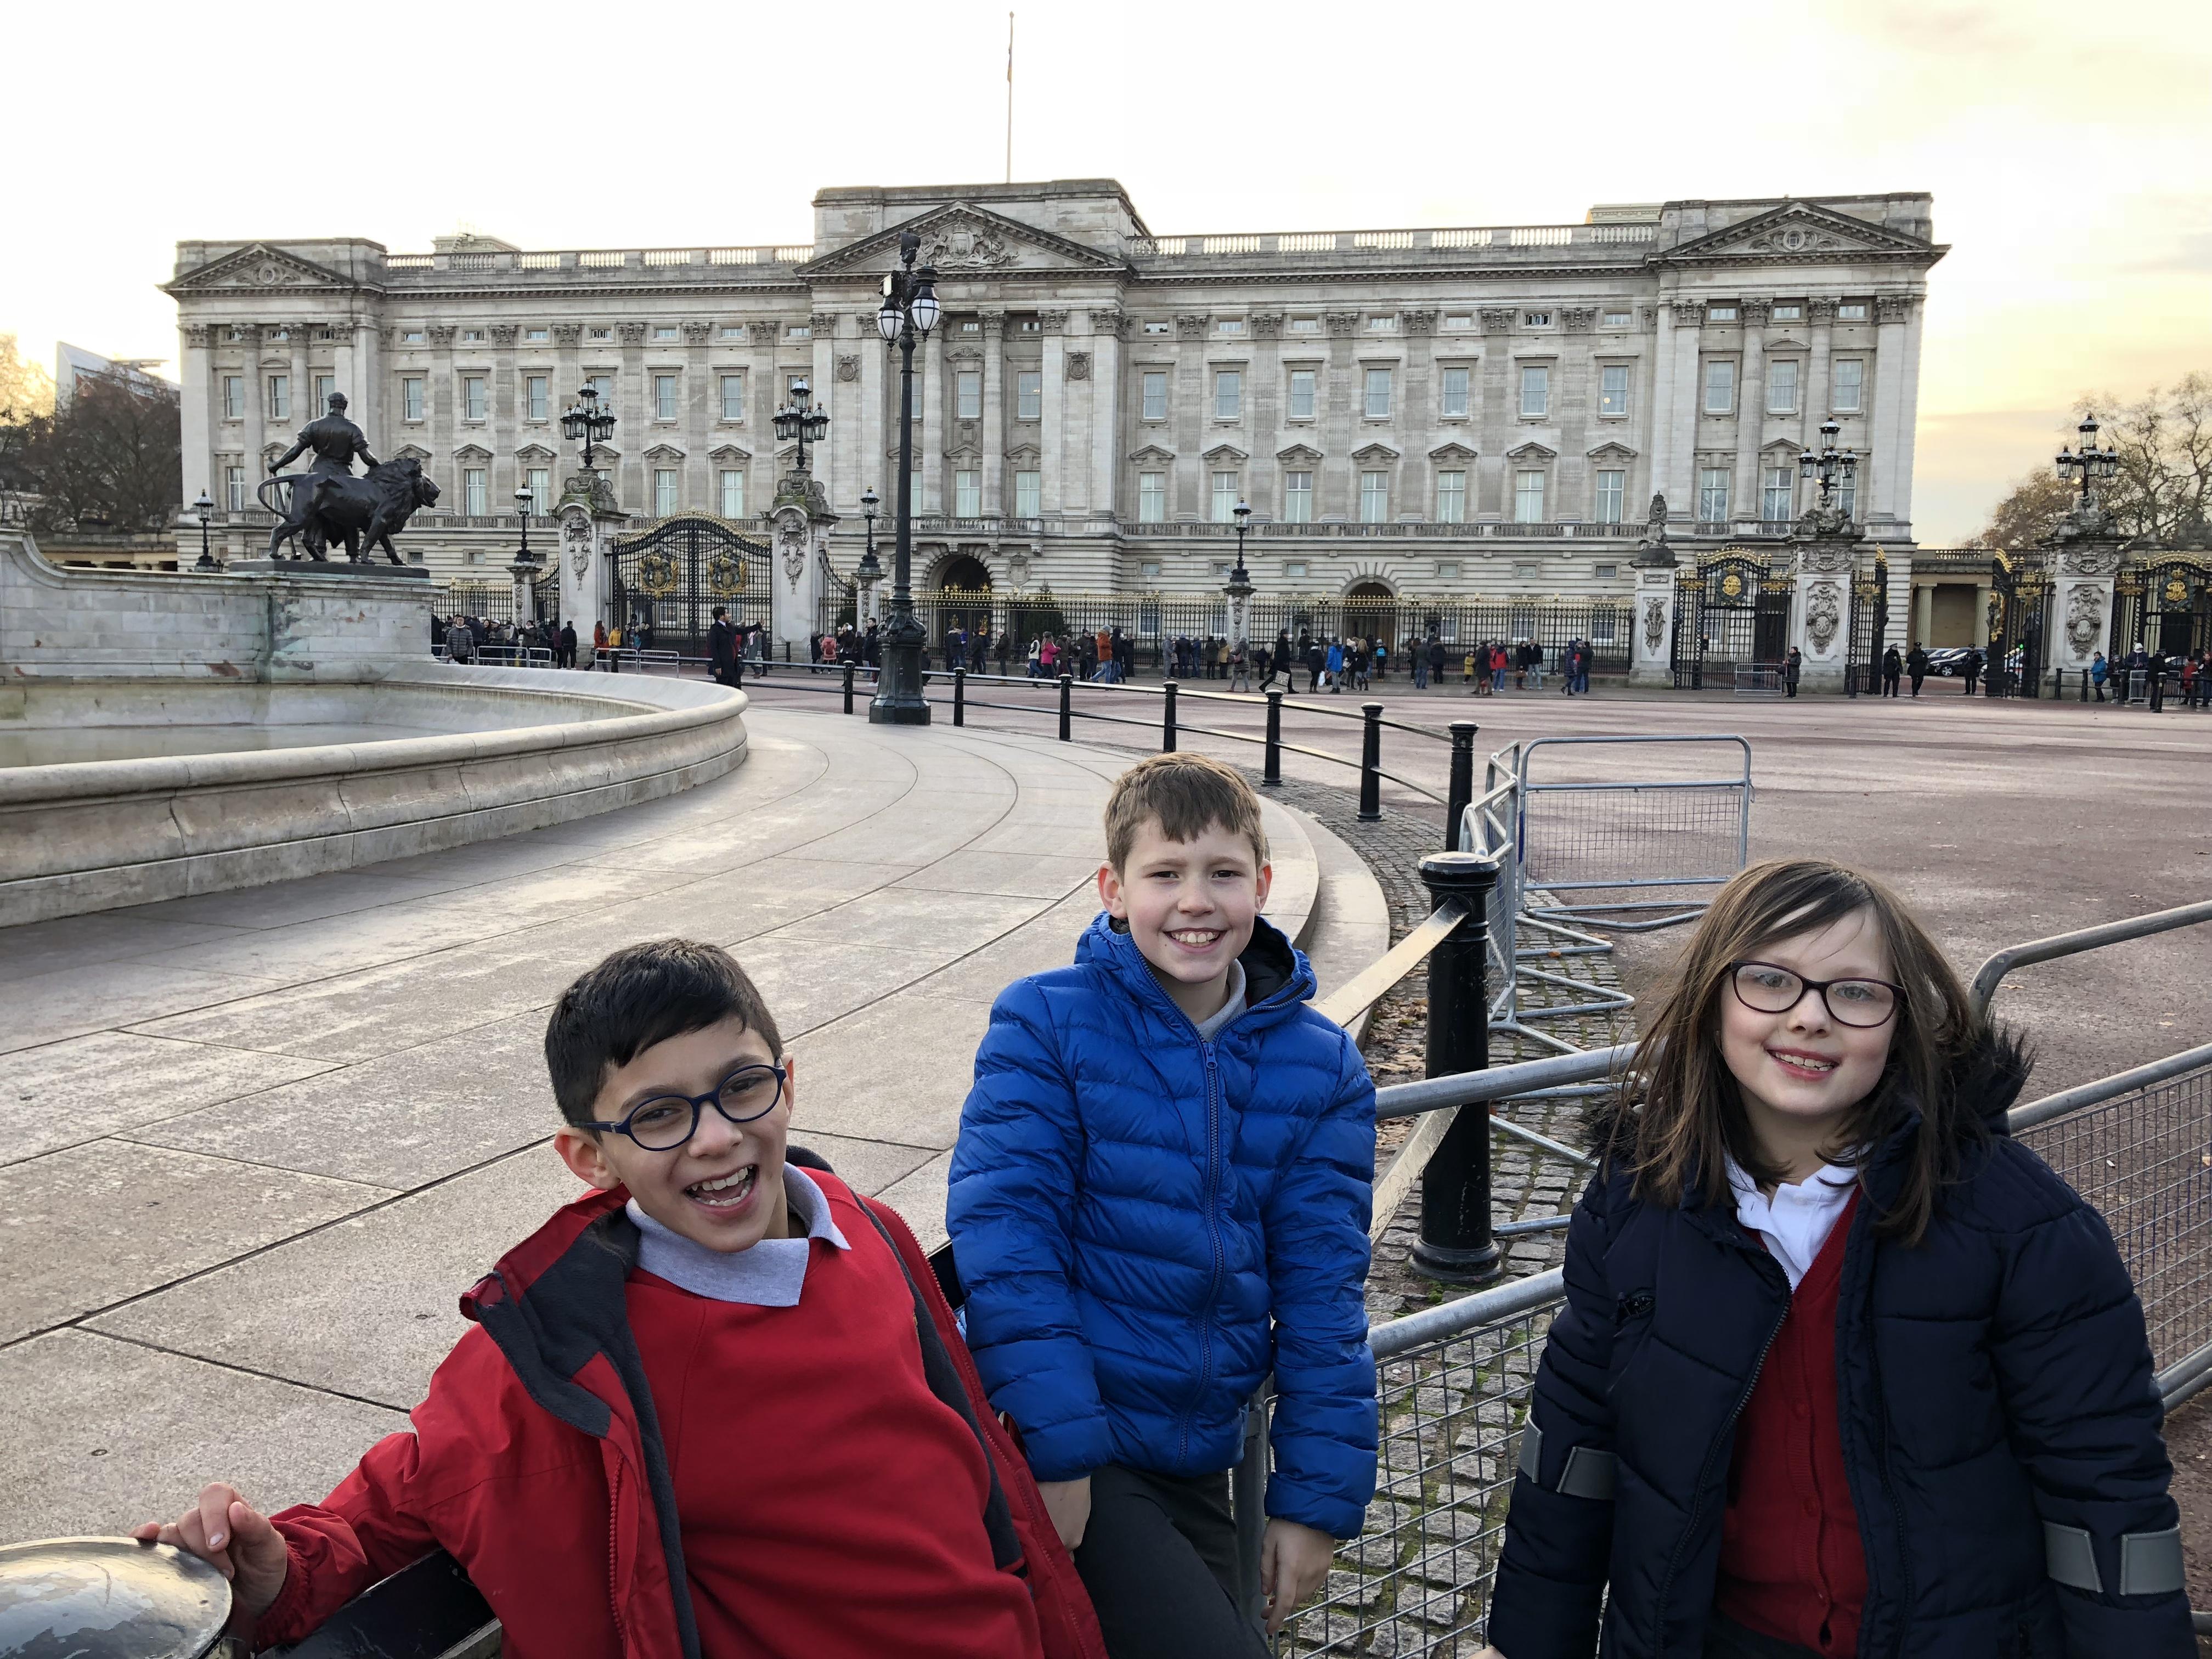 Children visiting Buckingham Palace